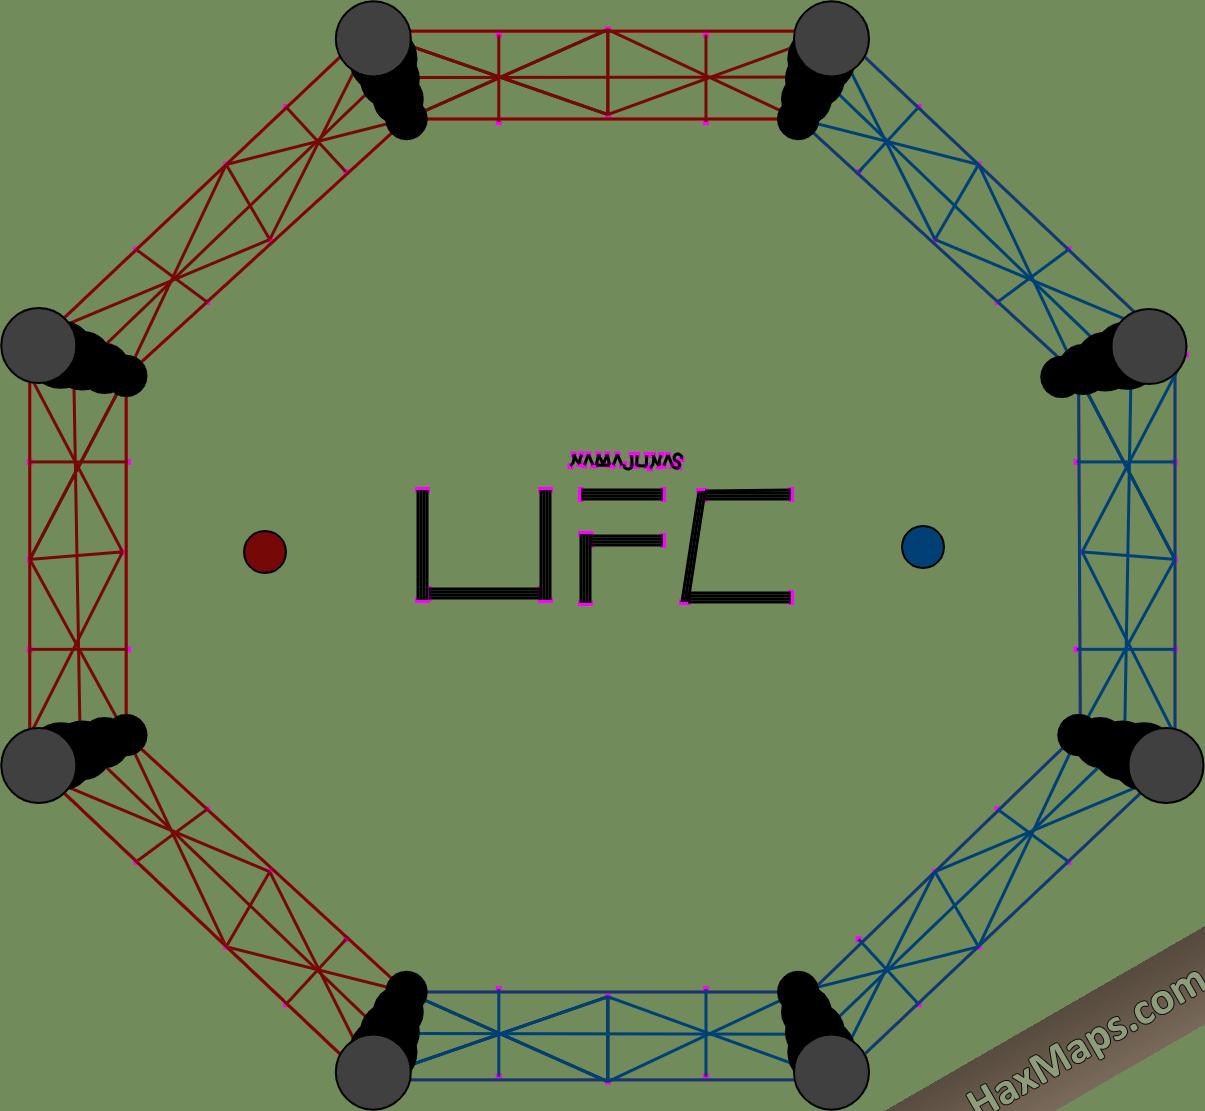 hax ball maps | Ultimate Fighting Championship by Namajunas